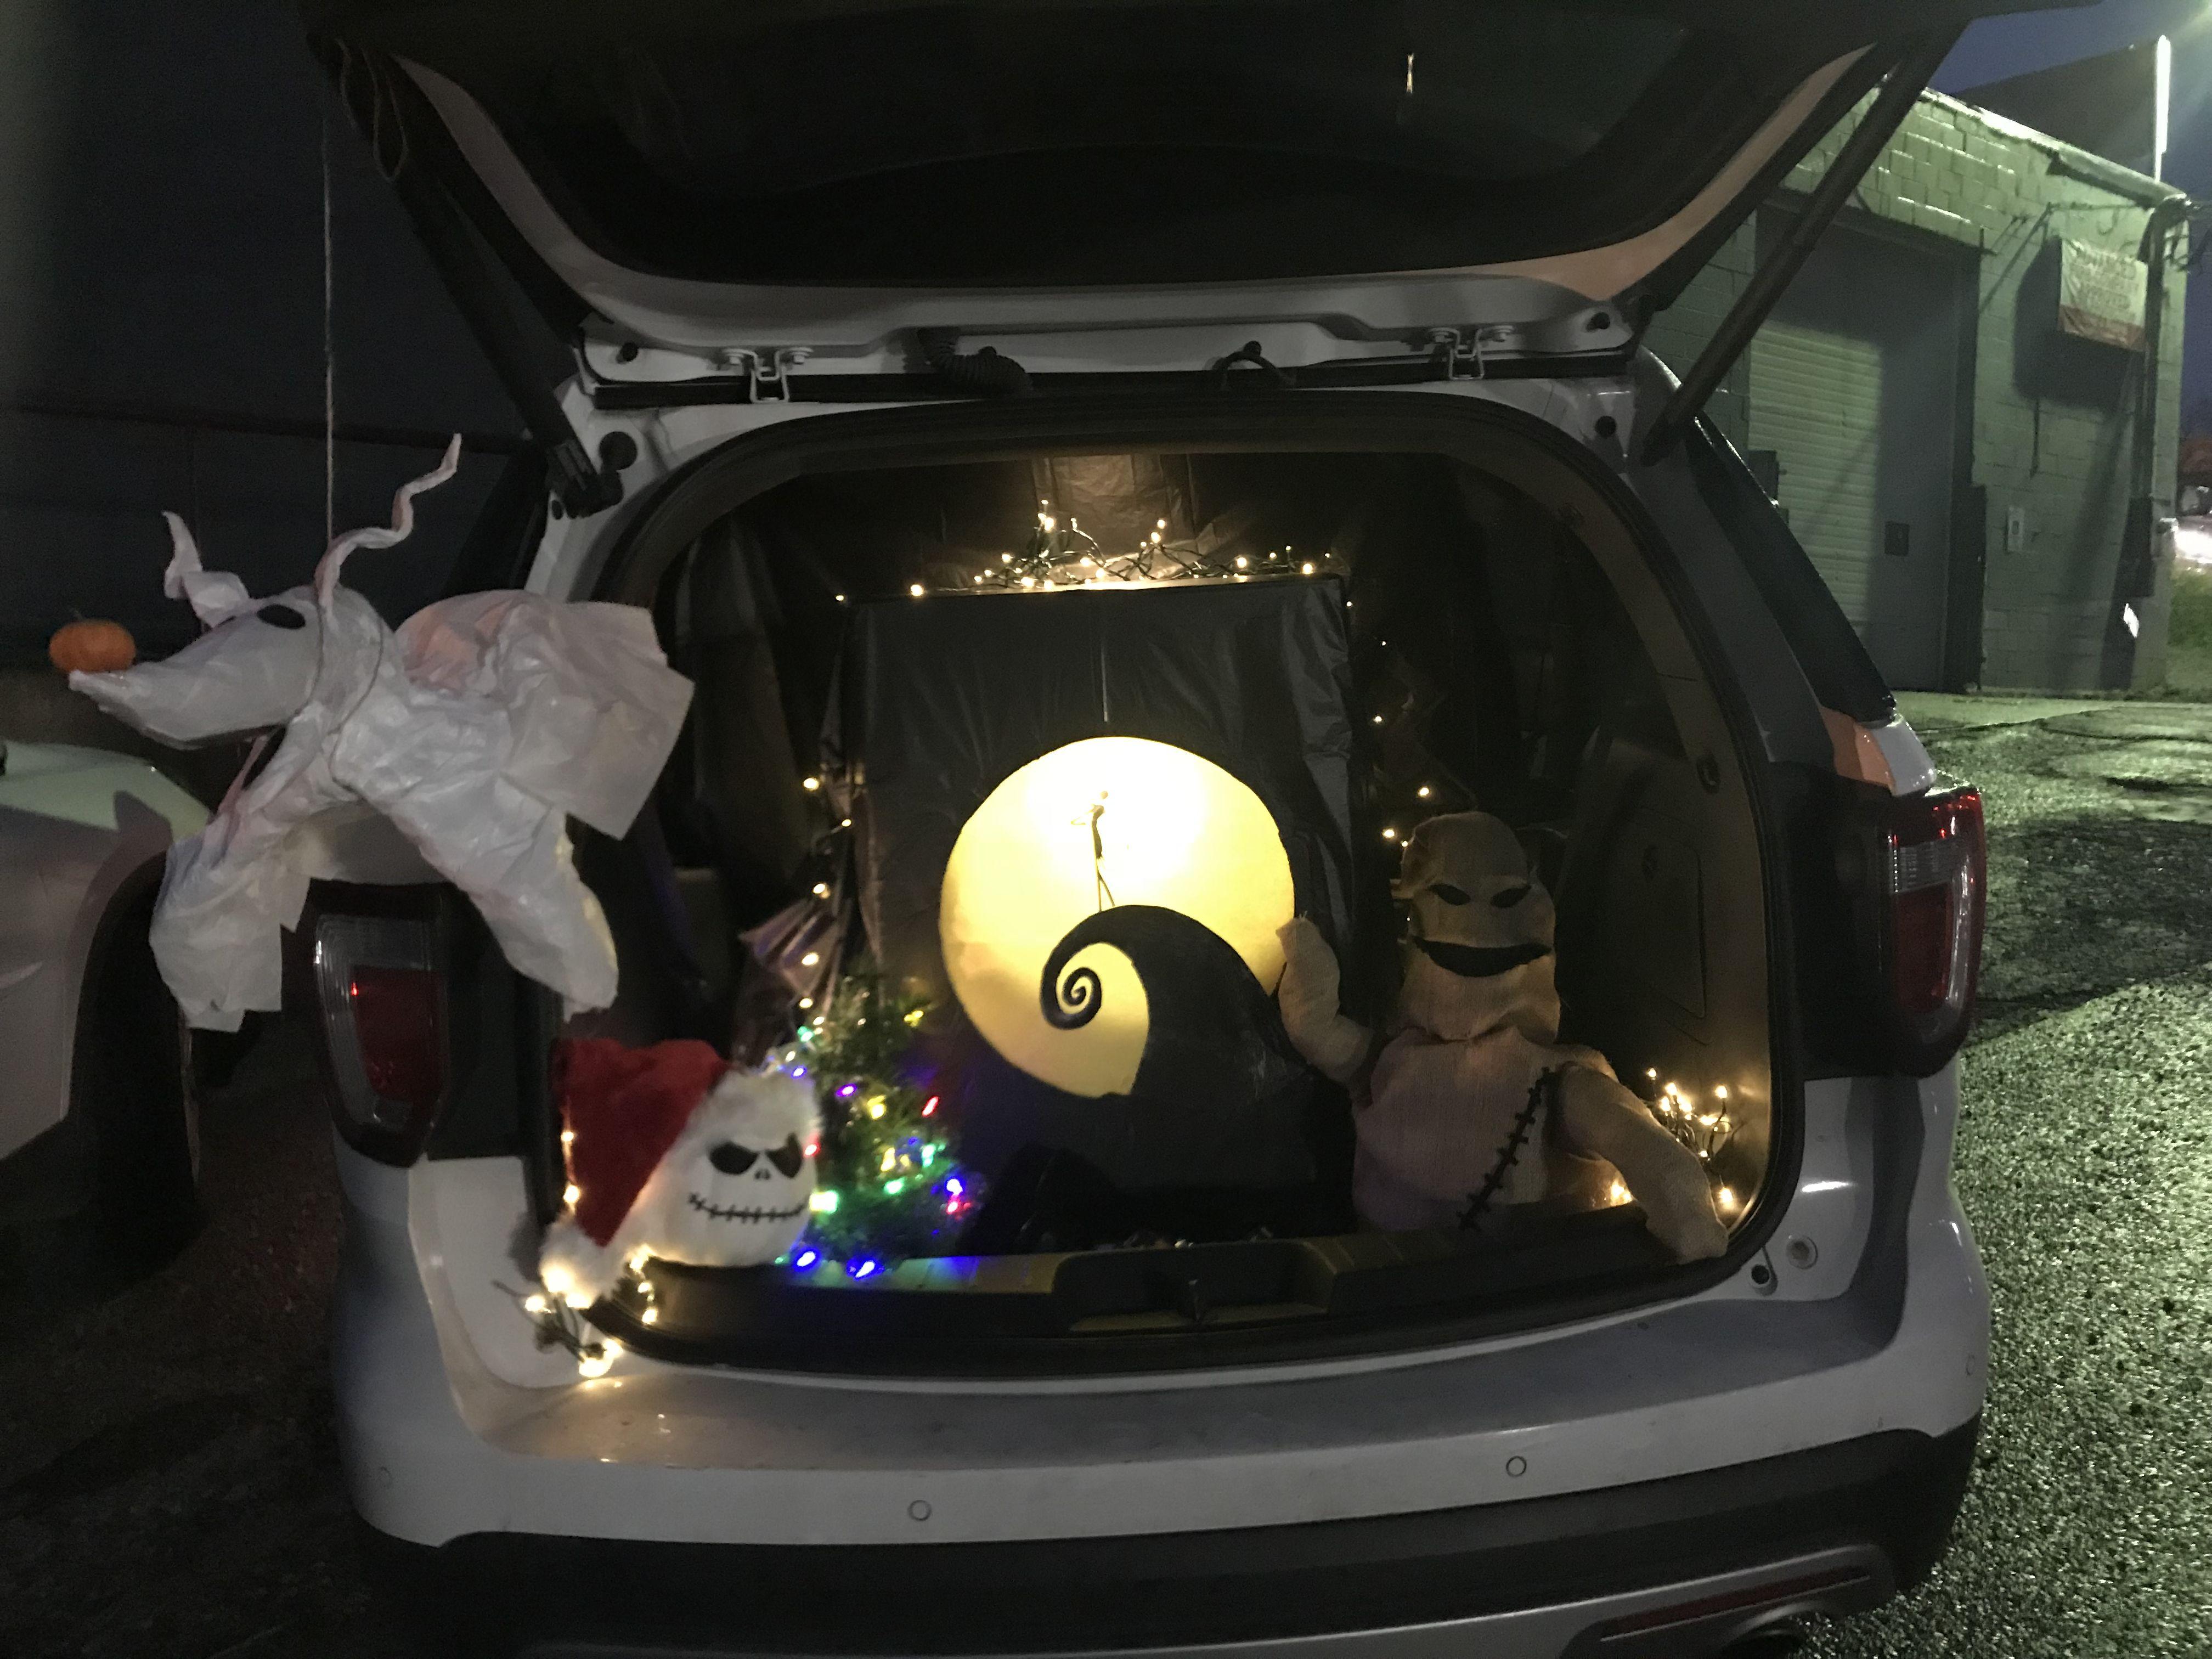 Nightmare Before Christmas Trunk-or-Treat 🎃 | Halloween in 2018 ...